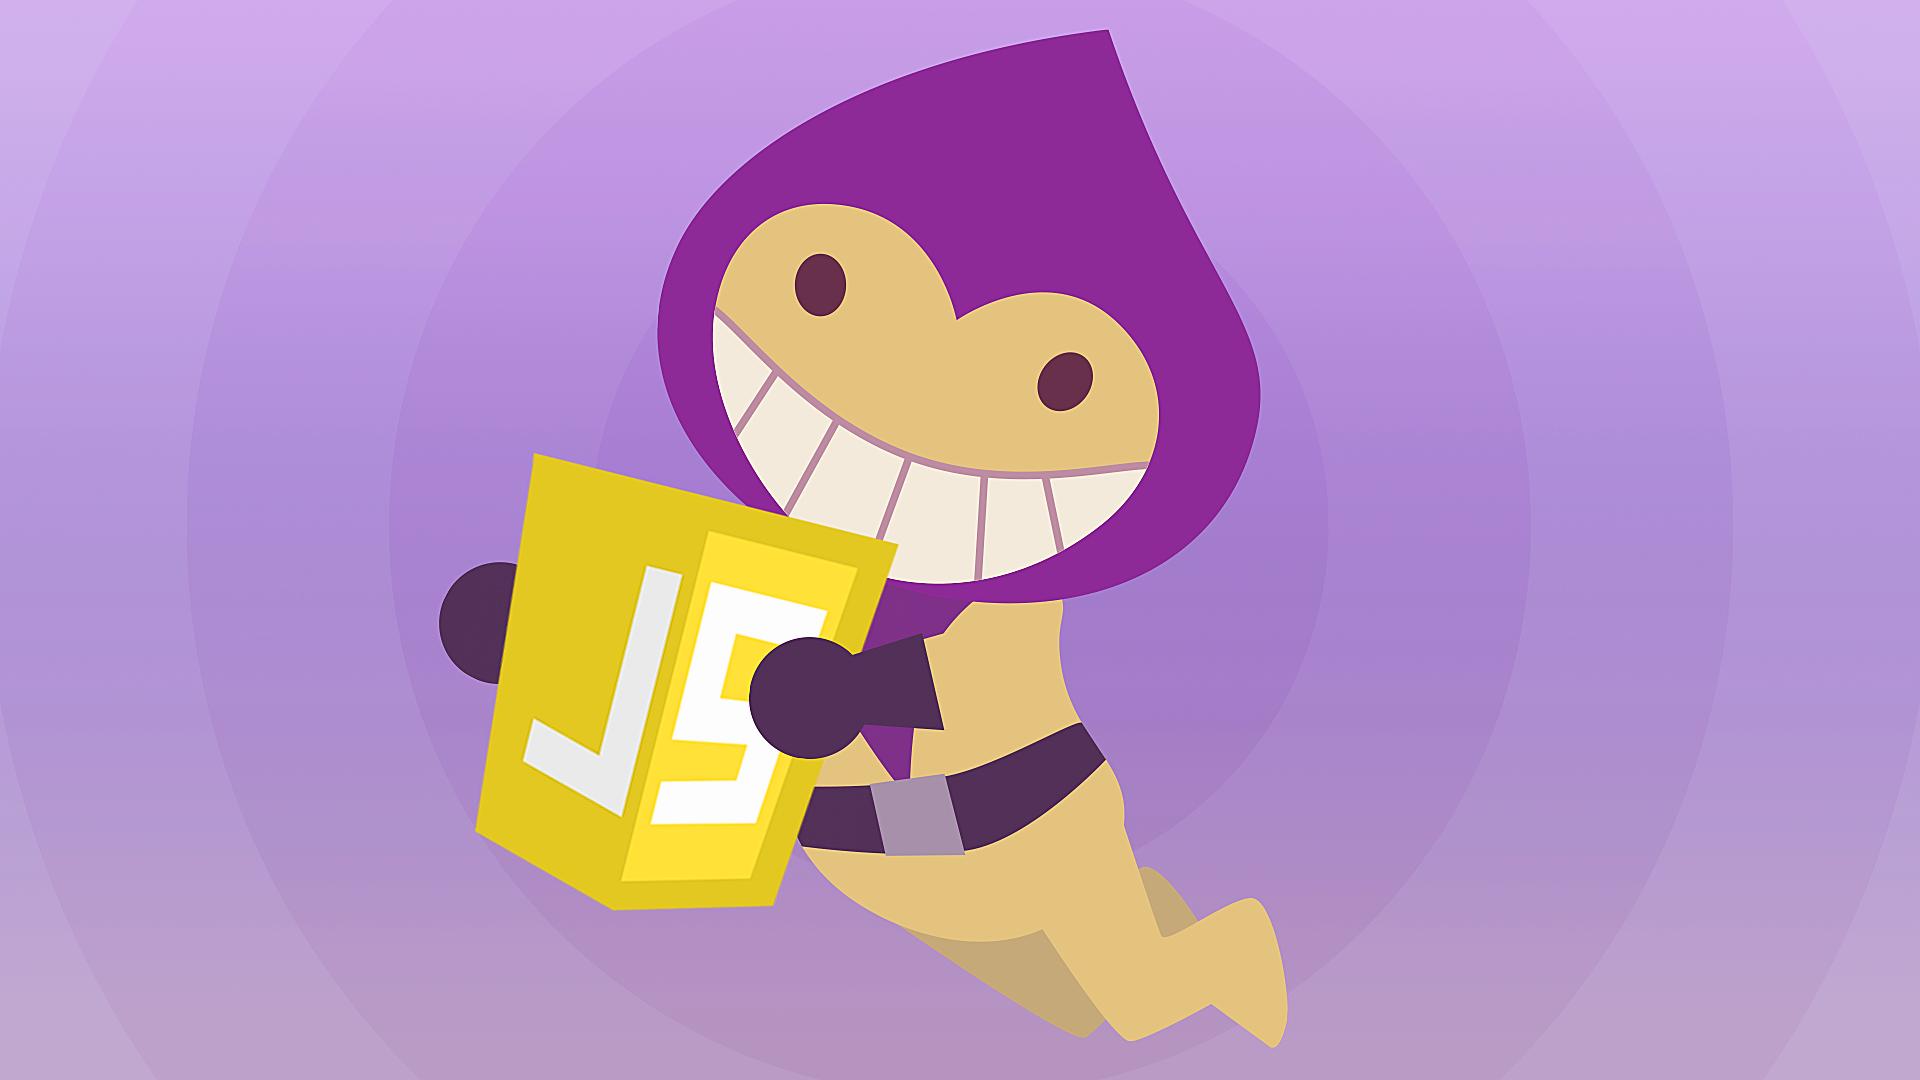 Вебинар Создание игр на JavaScript с помощью Phaser фото